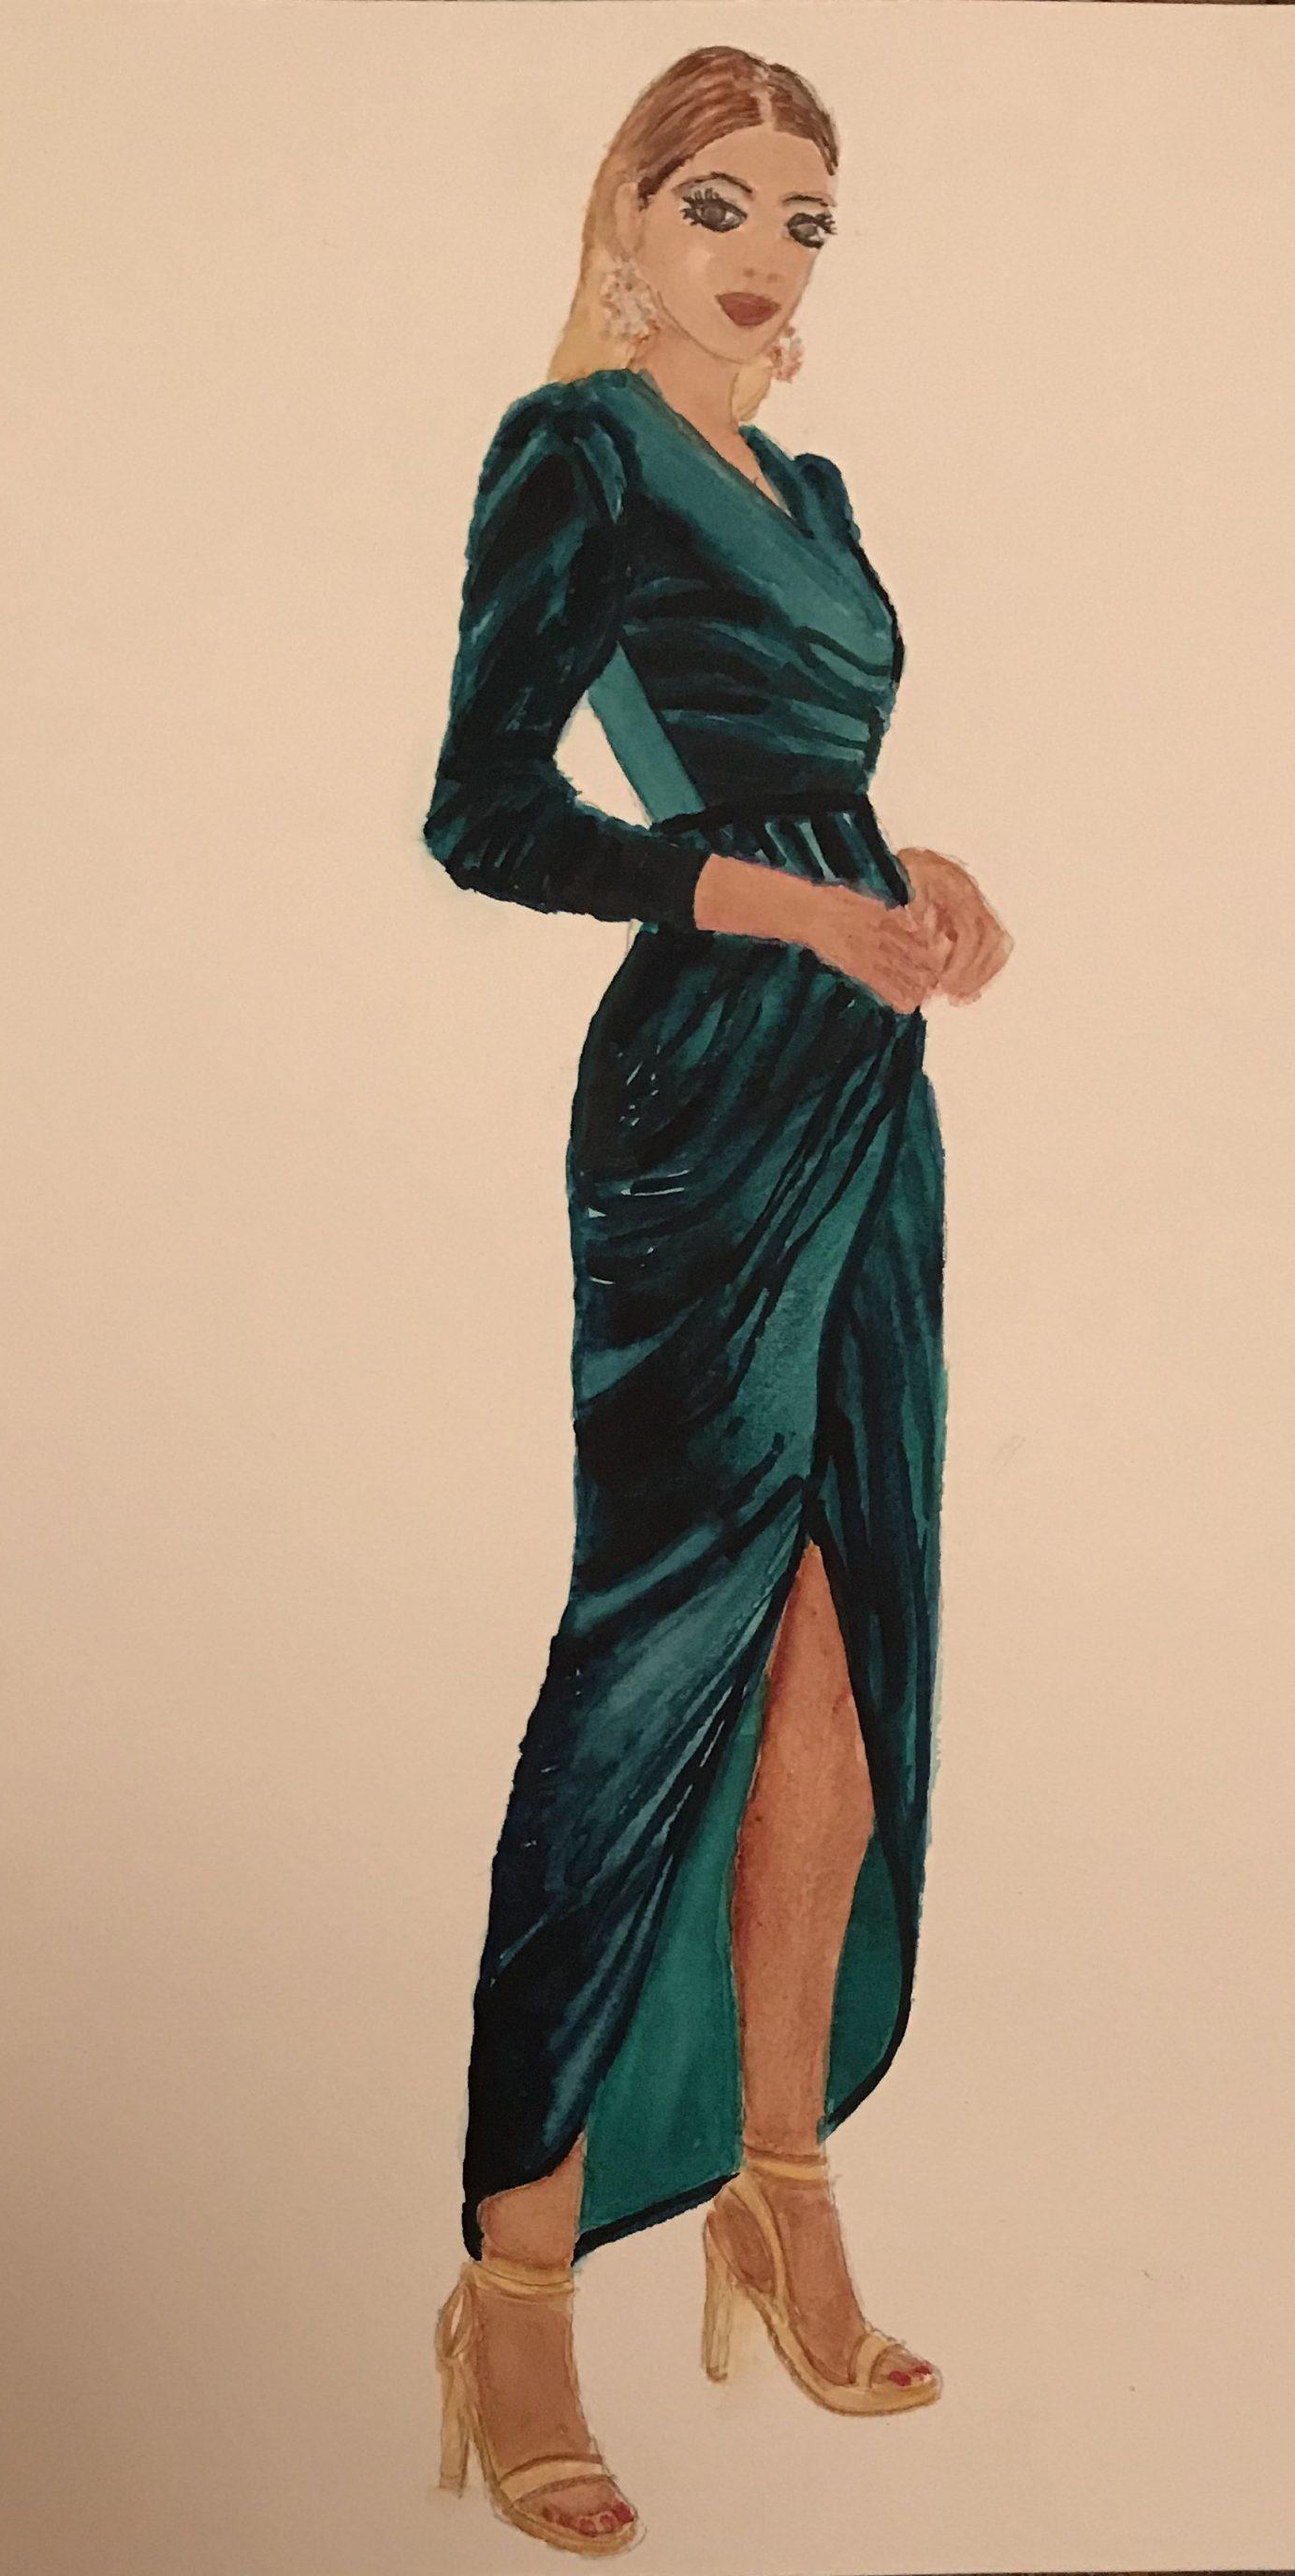 Velvet Fashion Illustration A Watercolour Painting Christina French